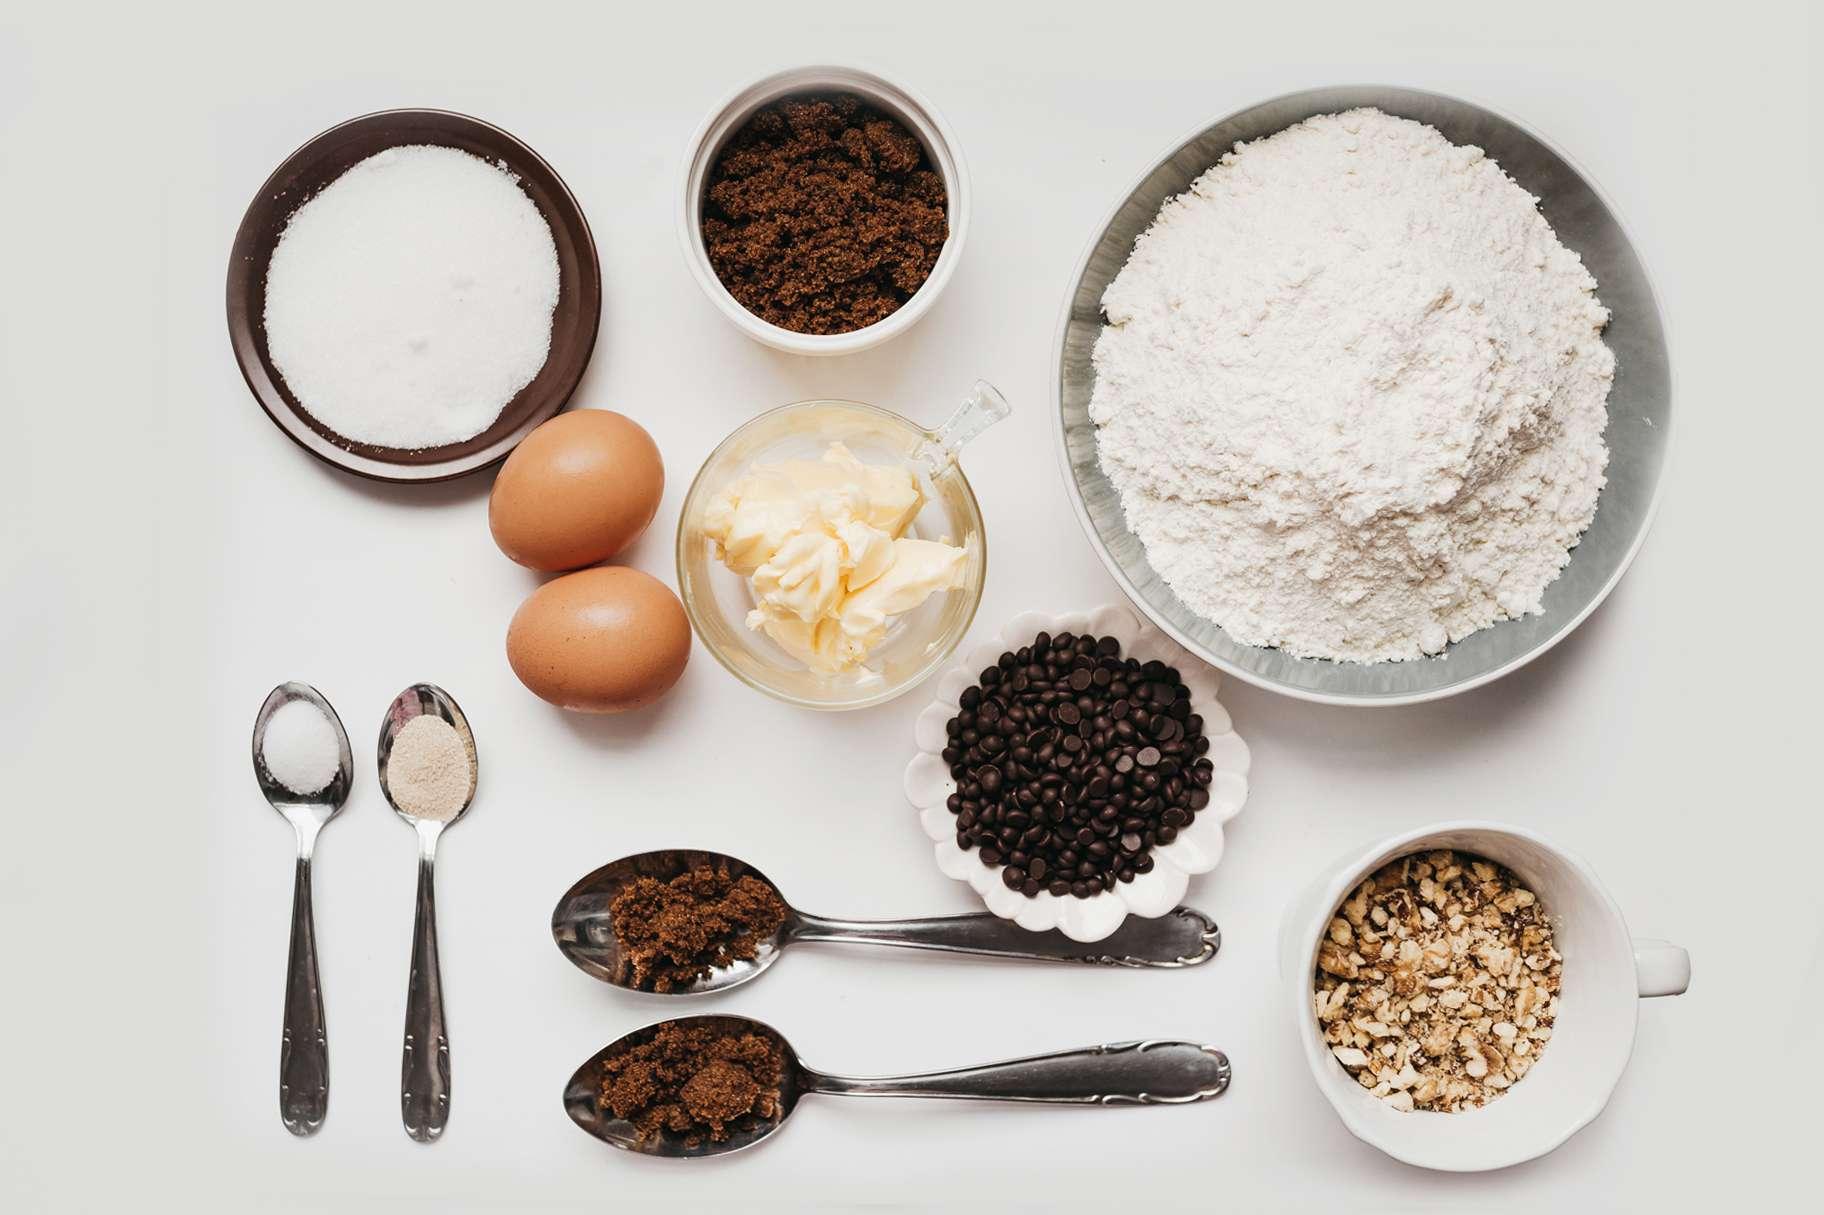 Jumbo Chocolate Chip Cookies Recipe ingredients